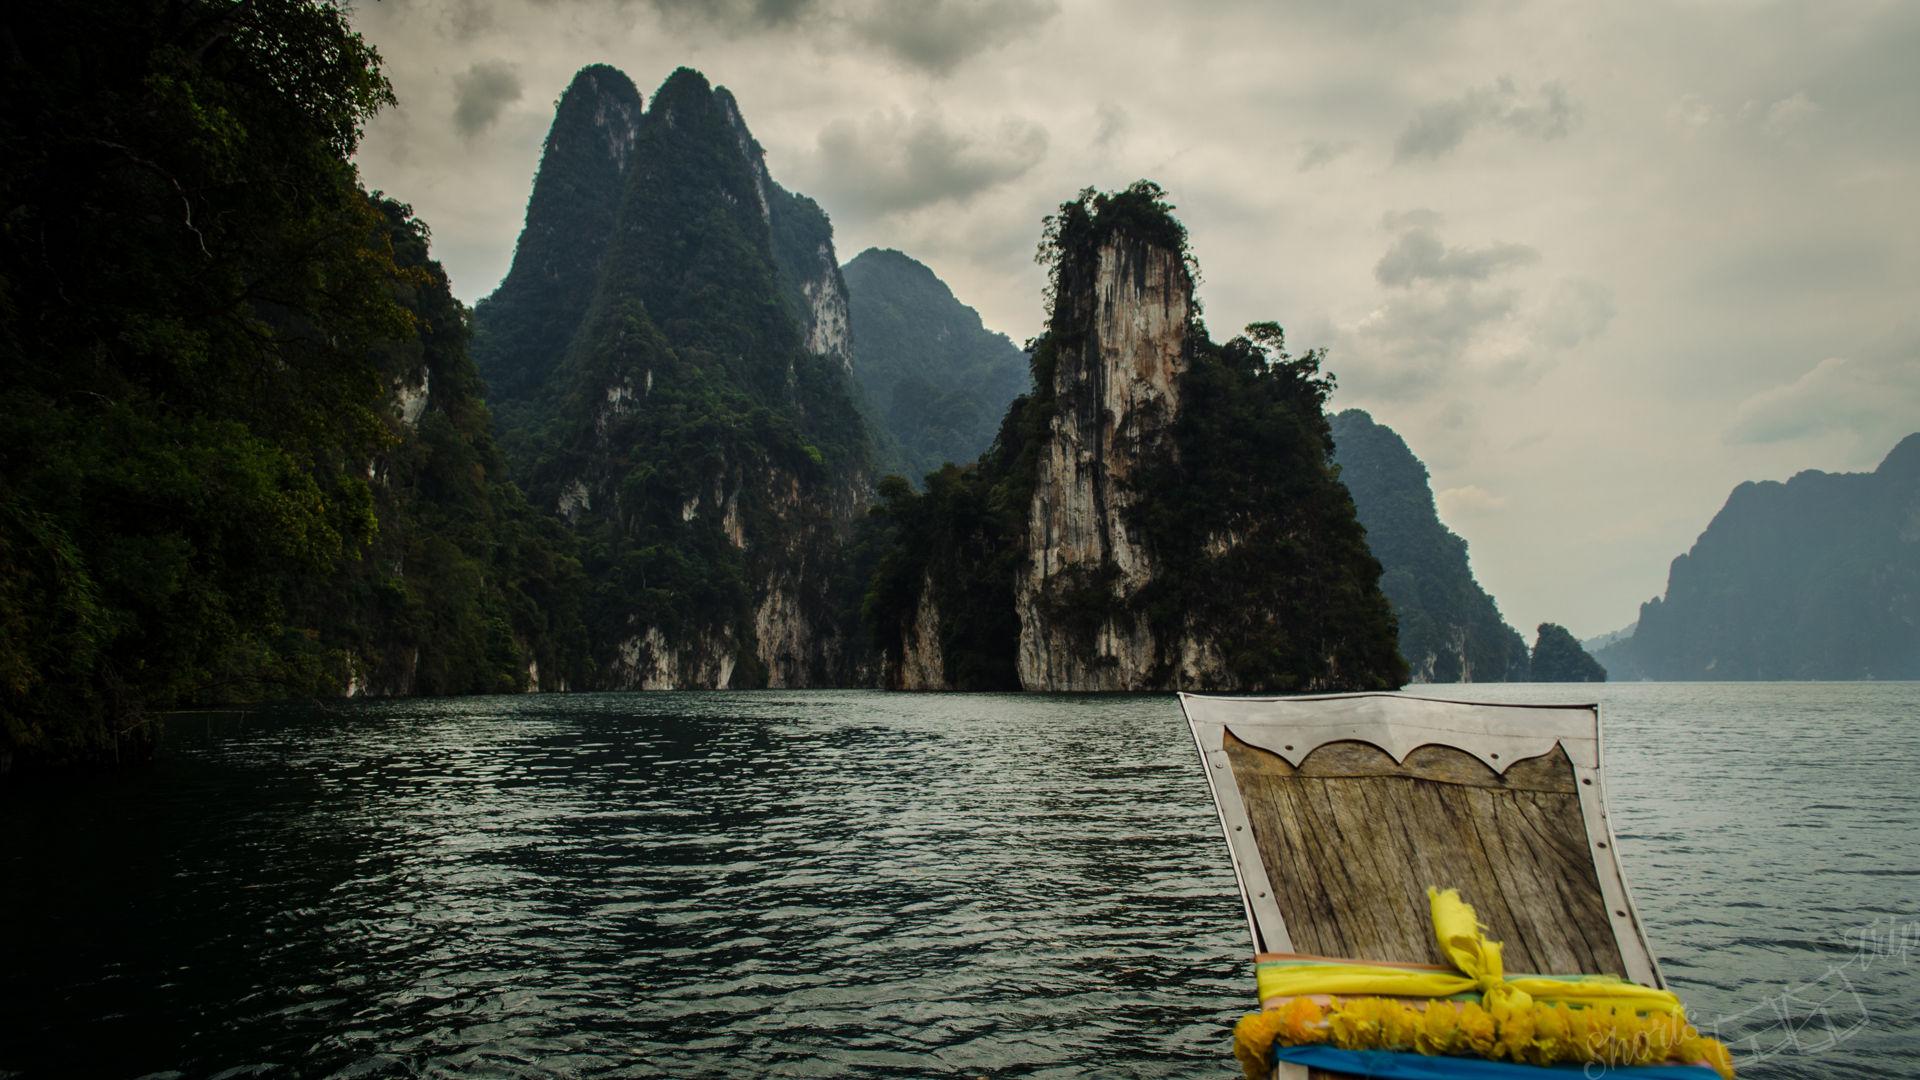 khao sok restaurant, cheow lan lake restaurant drone, drone khao sok, drone cheow lan lake, chiew lan lake drone